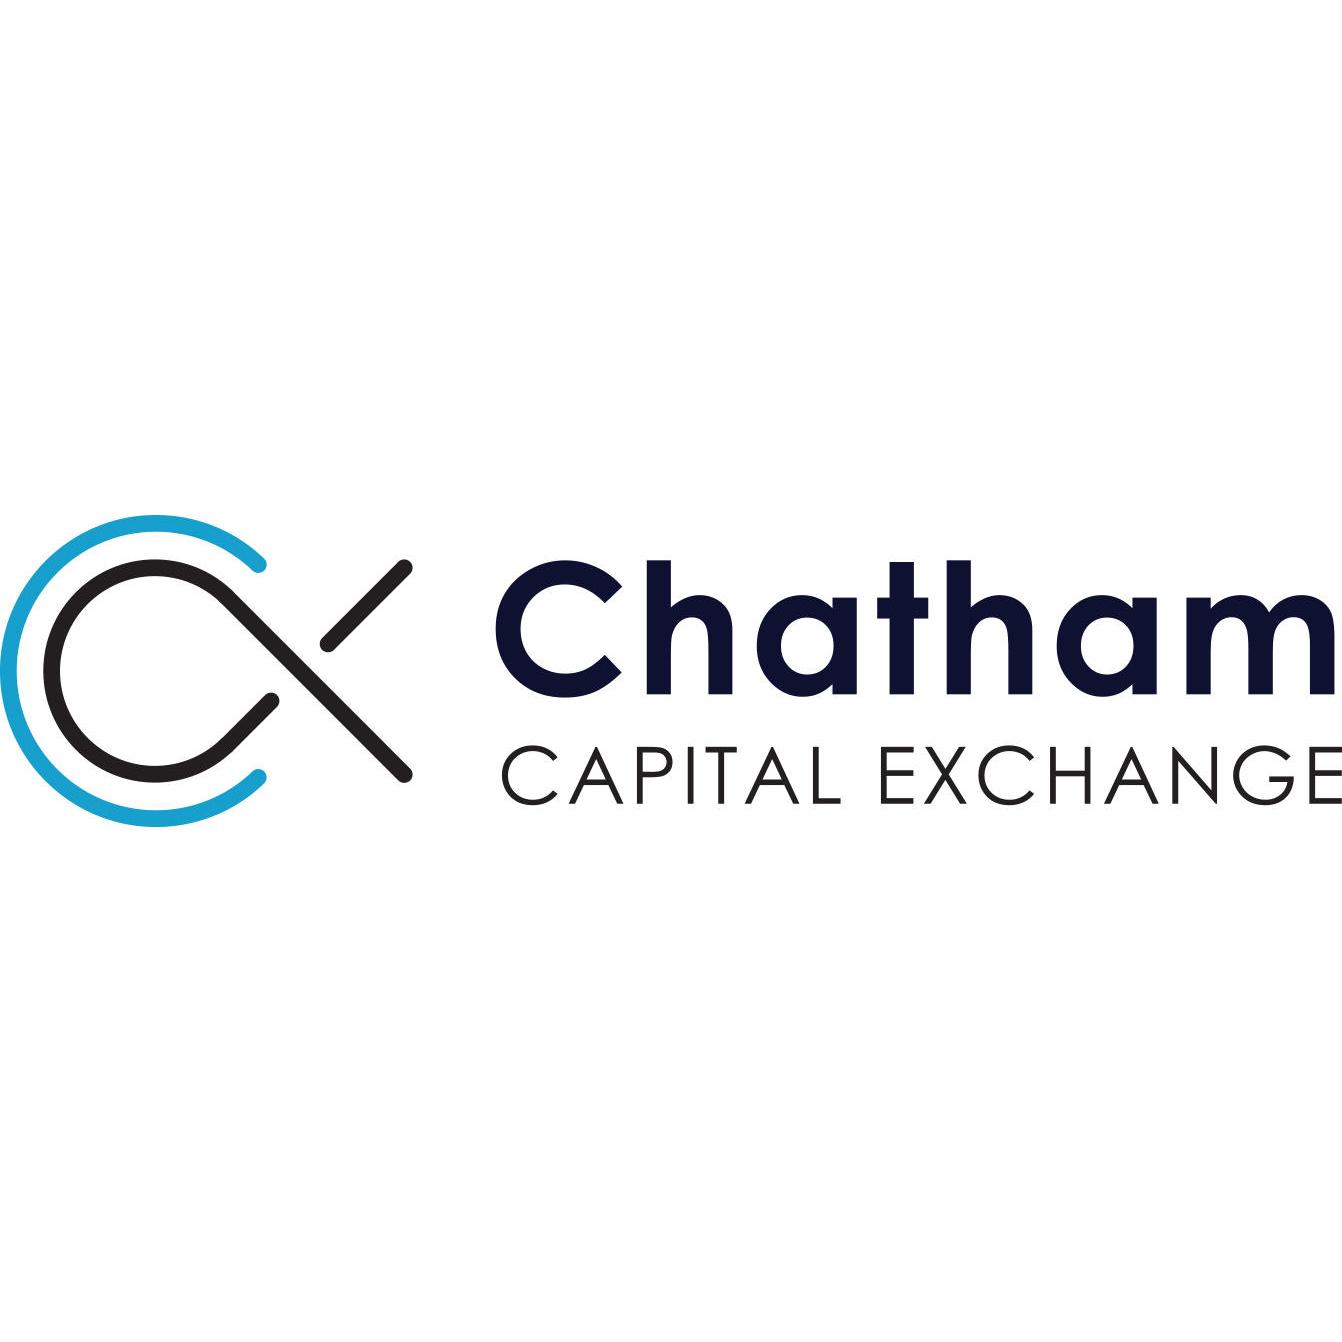 Chatham Capital Exchange - Adelaide, SA 5000 - (08) 7132 5457 | ShowMeLocal.com